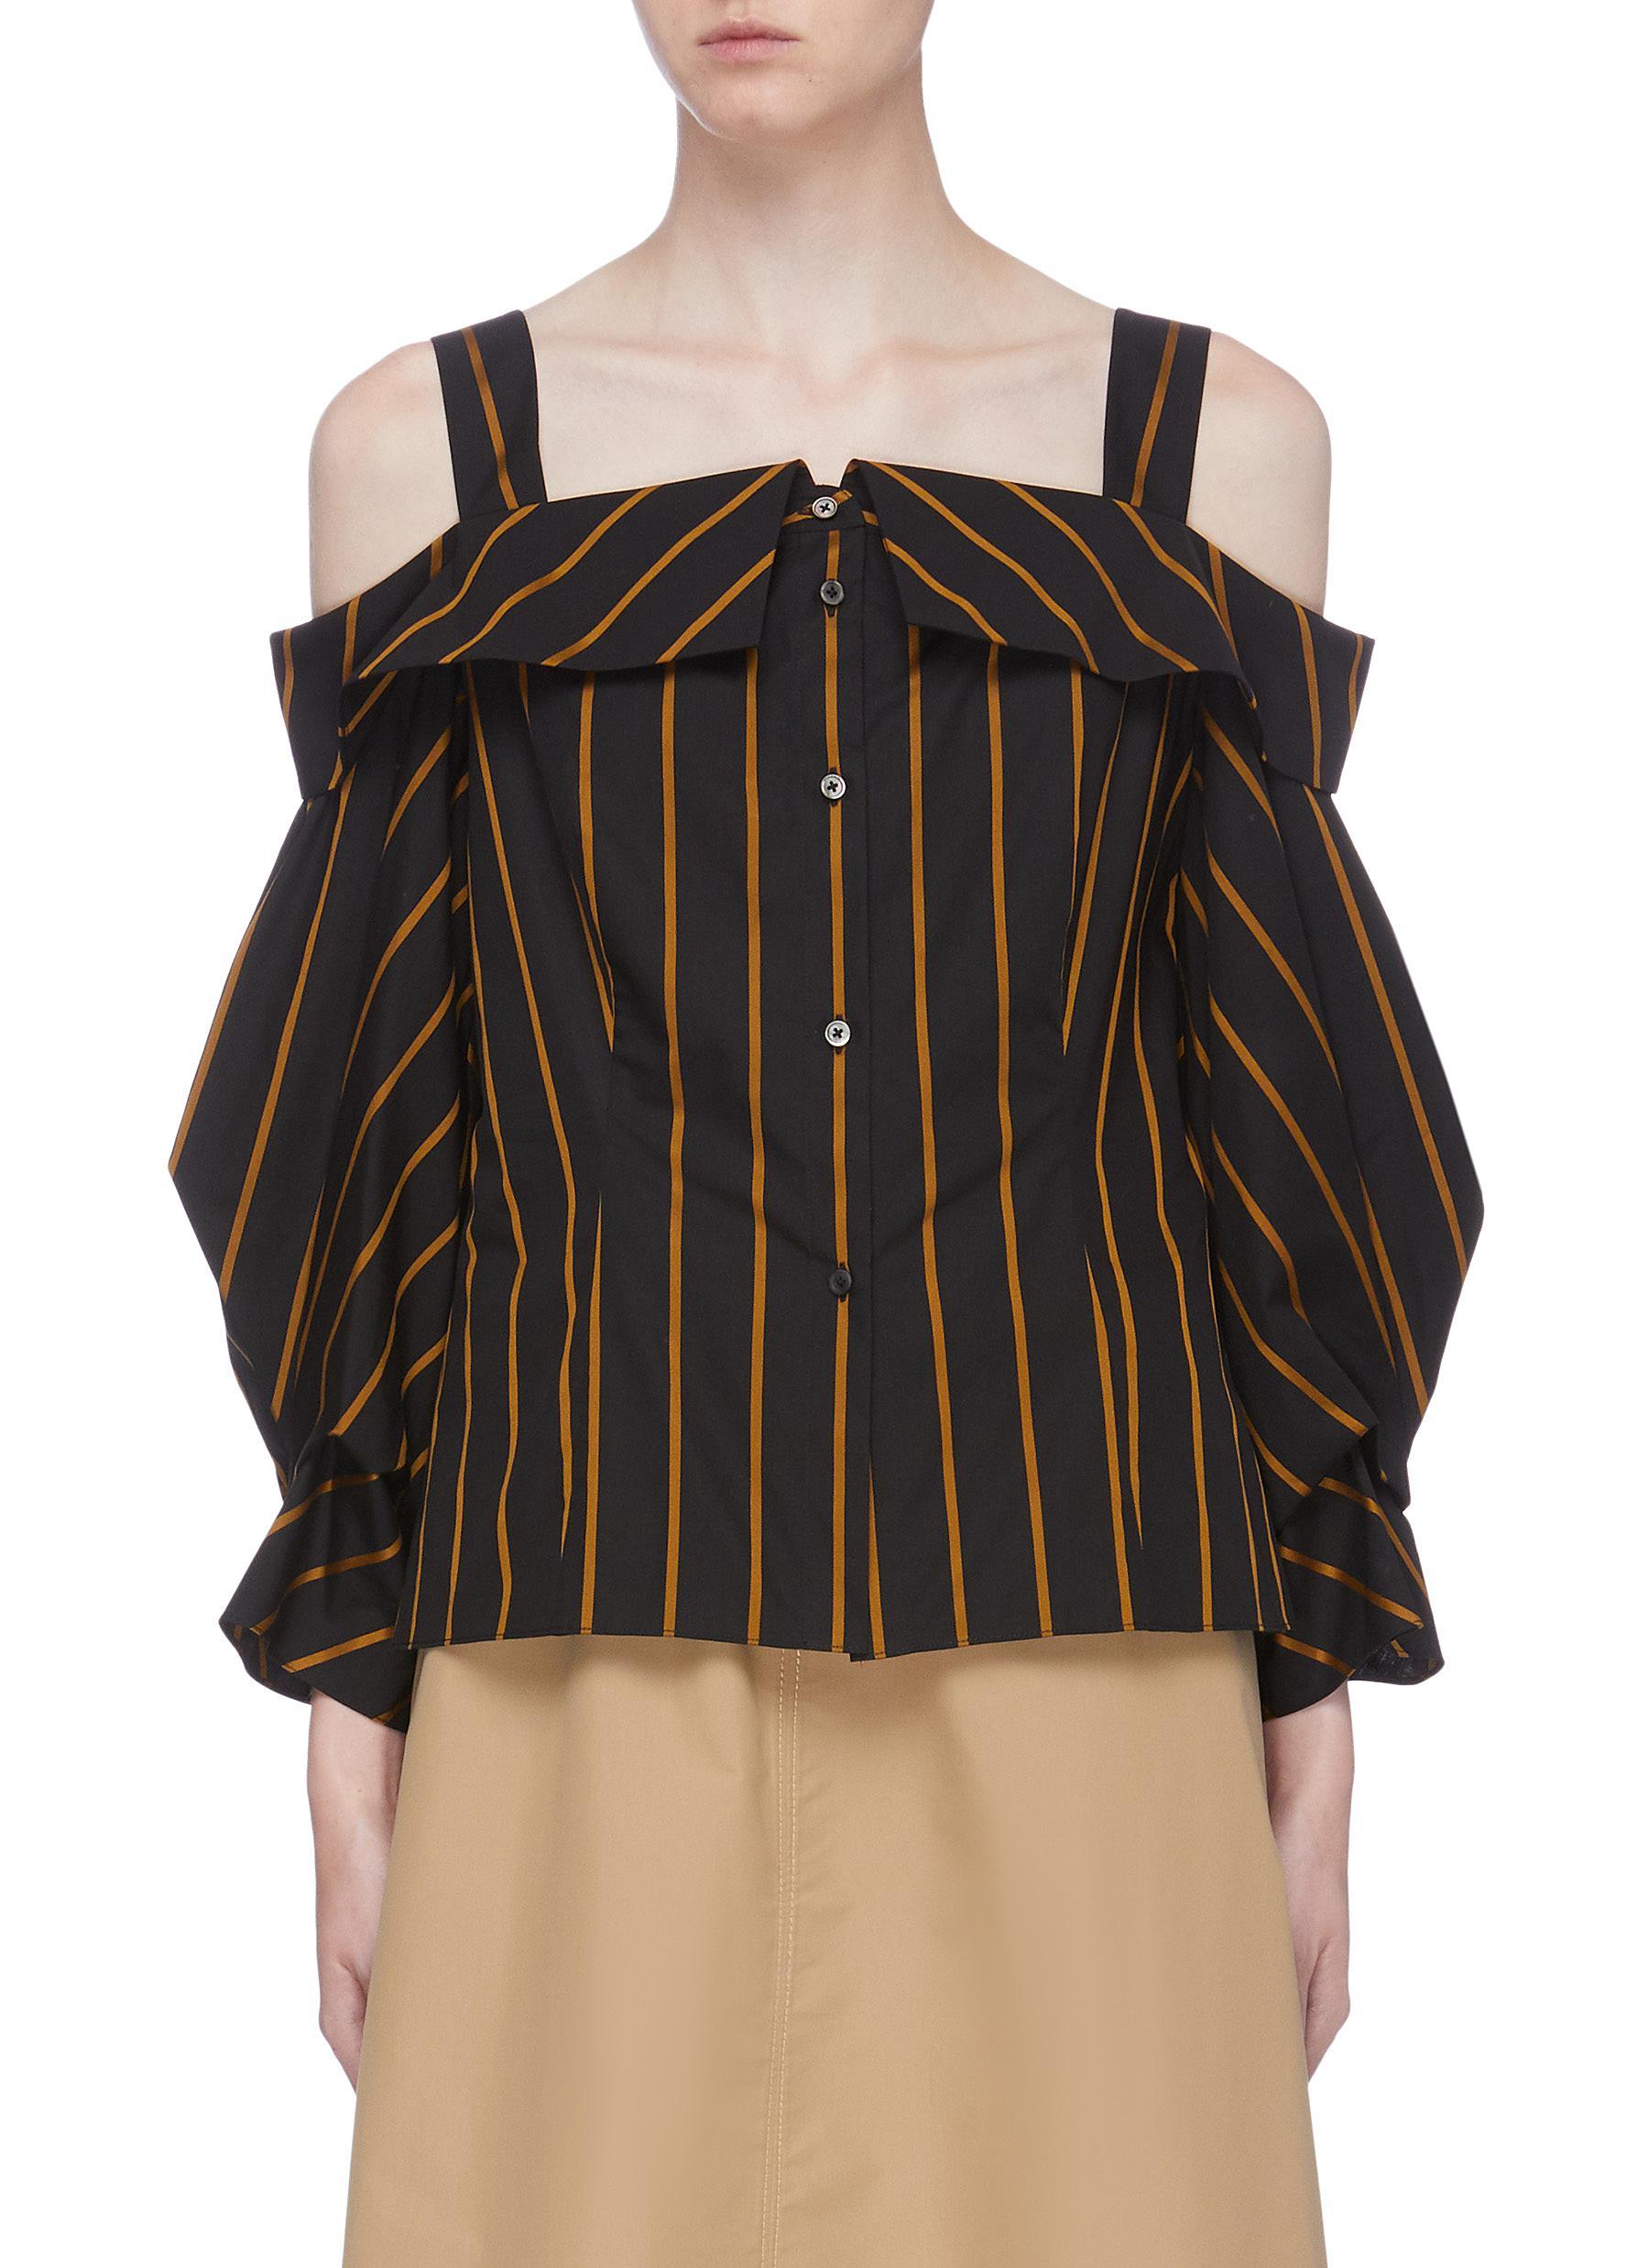 Cold shoulder stripe blouse by Portspure